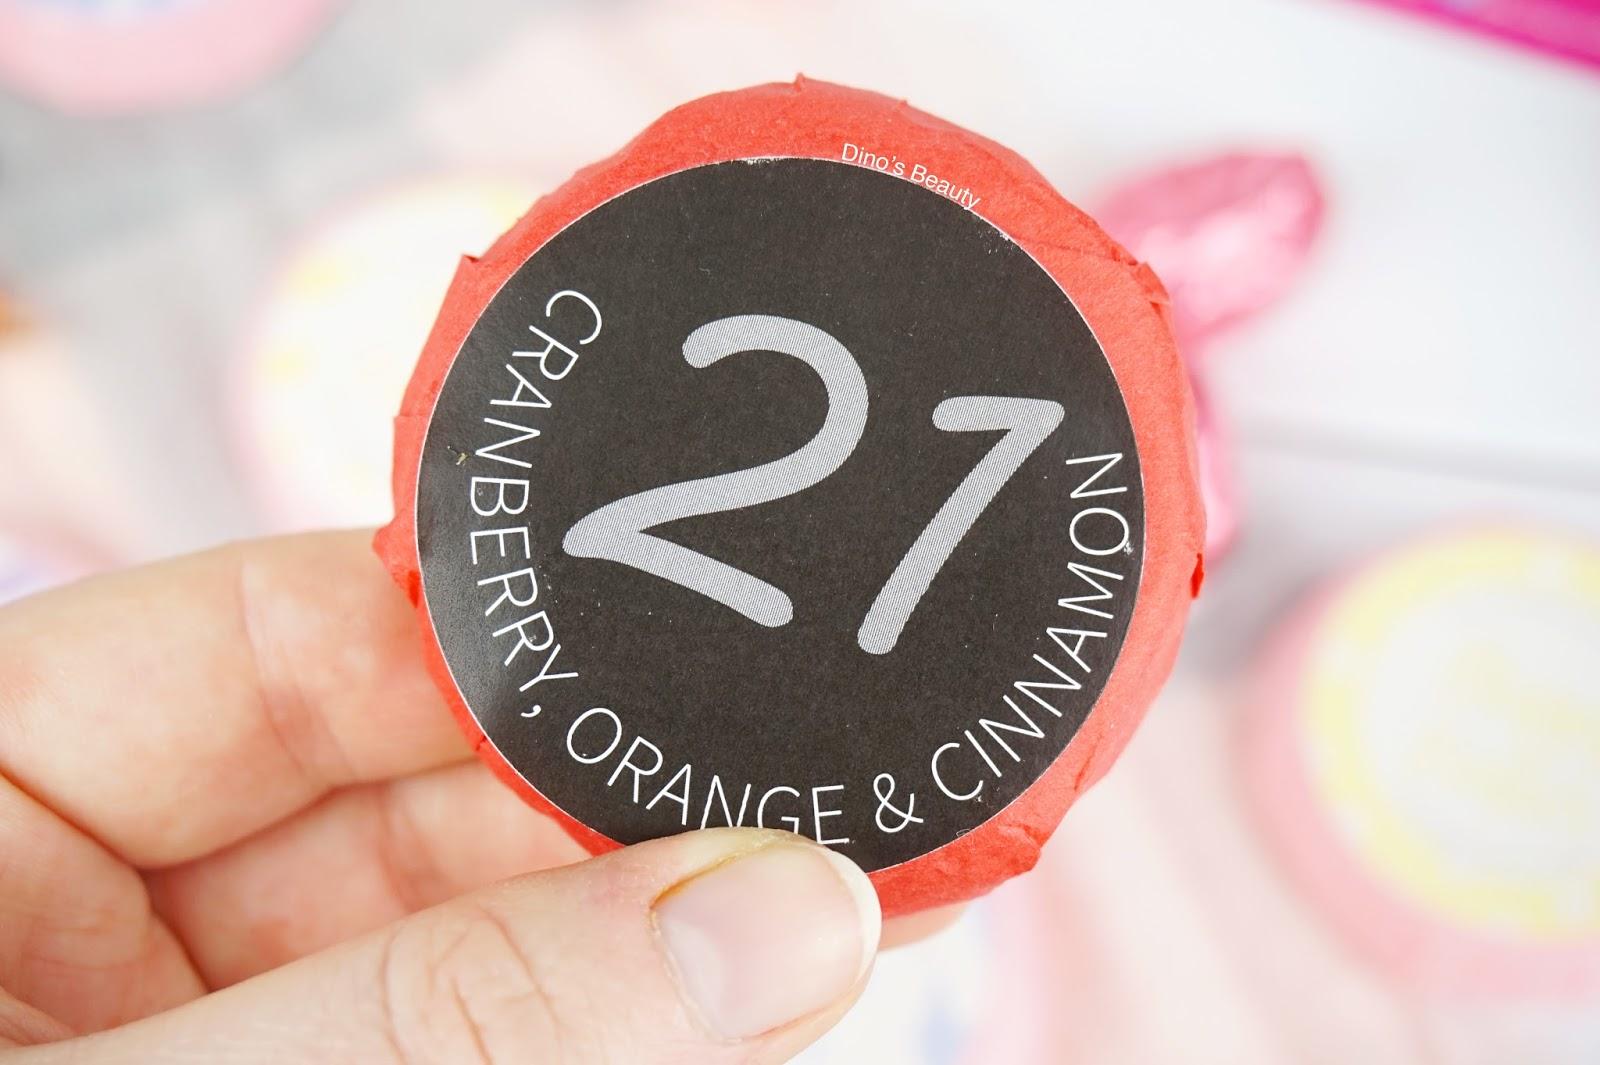 #MeltCrowd, April, 2017, April 2017, Candles, Flamingo Candles, Melt Crowd, The Melt Crowd, Wax Melts, Candles, Lychee & Peony, Chocolate, Macaroon & Almond, Lavender & Chamomile, Juicy Pomelo, Pineapple & Raspberry, Bunny Kisses, Bunny Pom-Poms, Cranberry Orange & Cinnamon